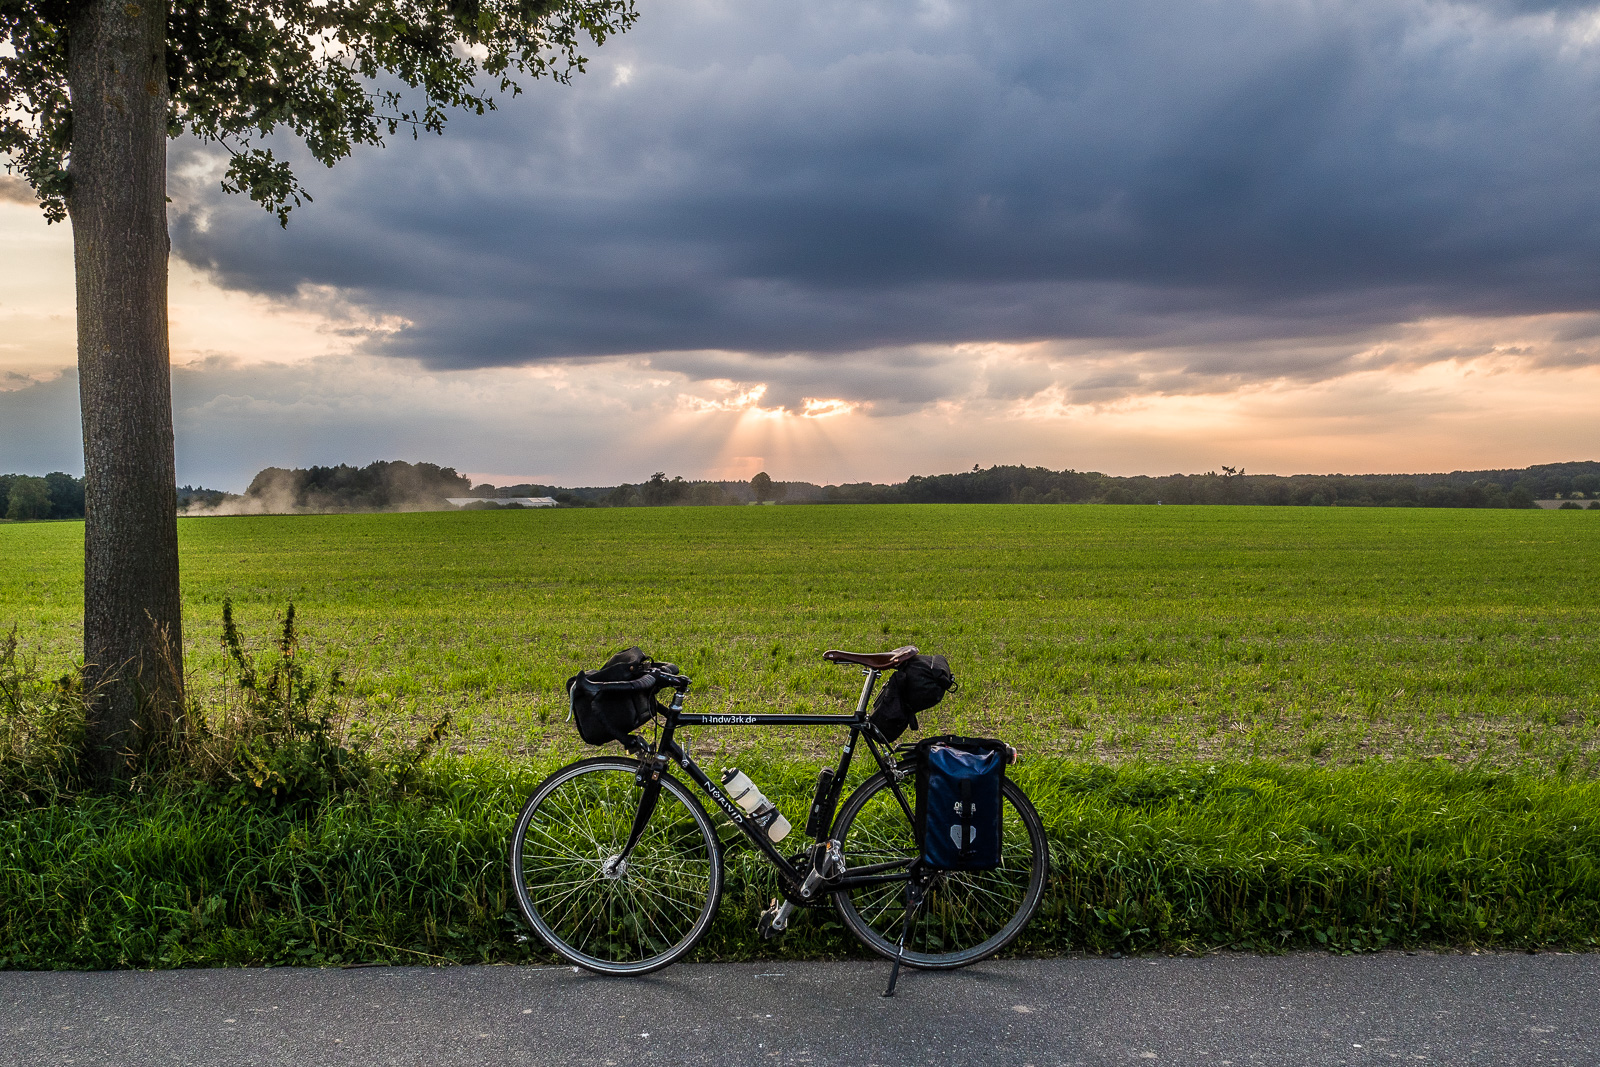 Fahrrad vor Sonnenuntergang, Lüneburger Heide bei Bienenbüttel